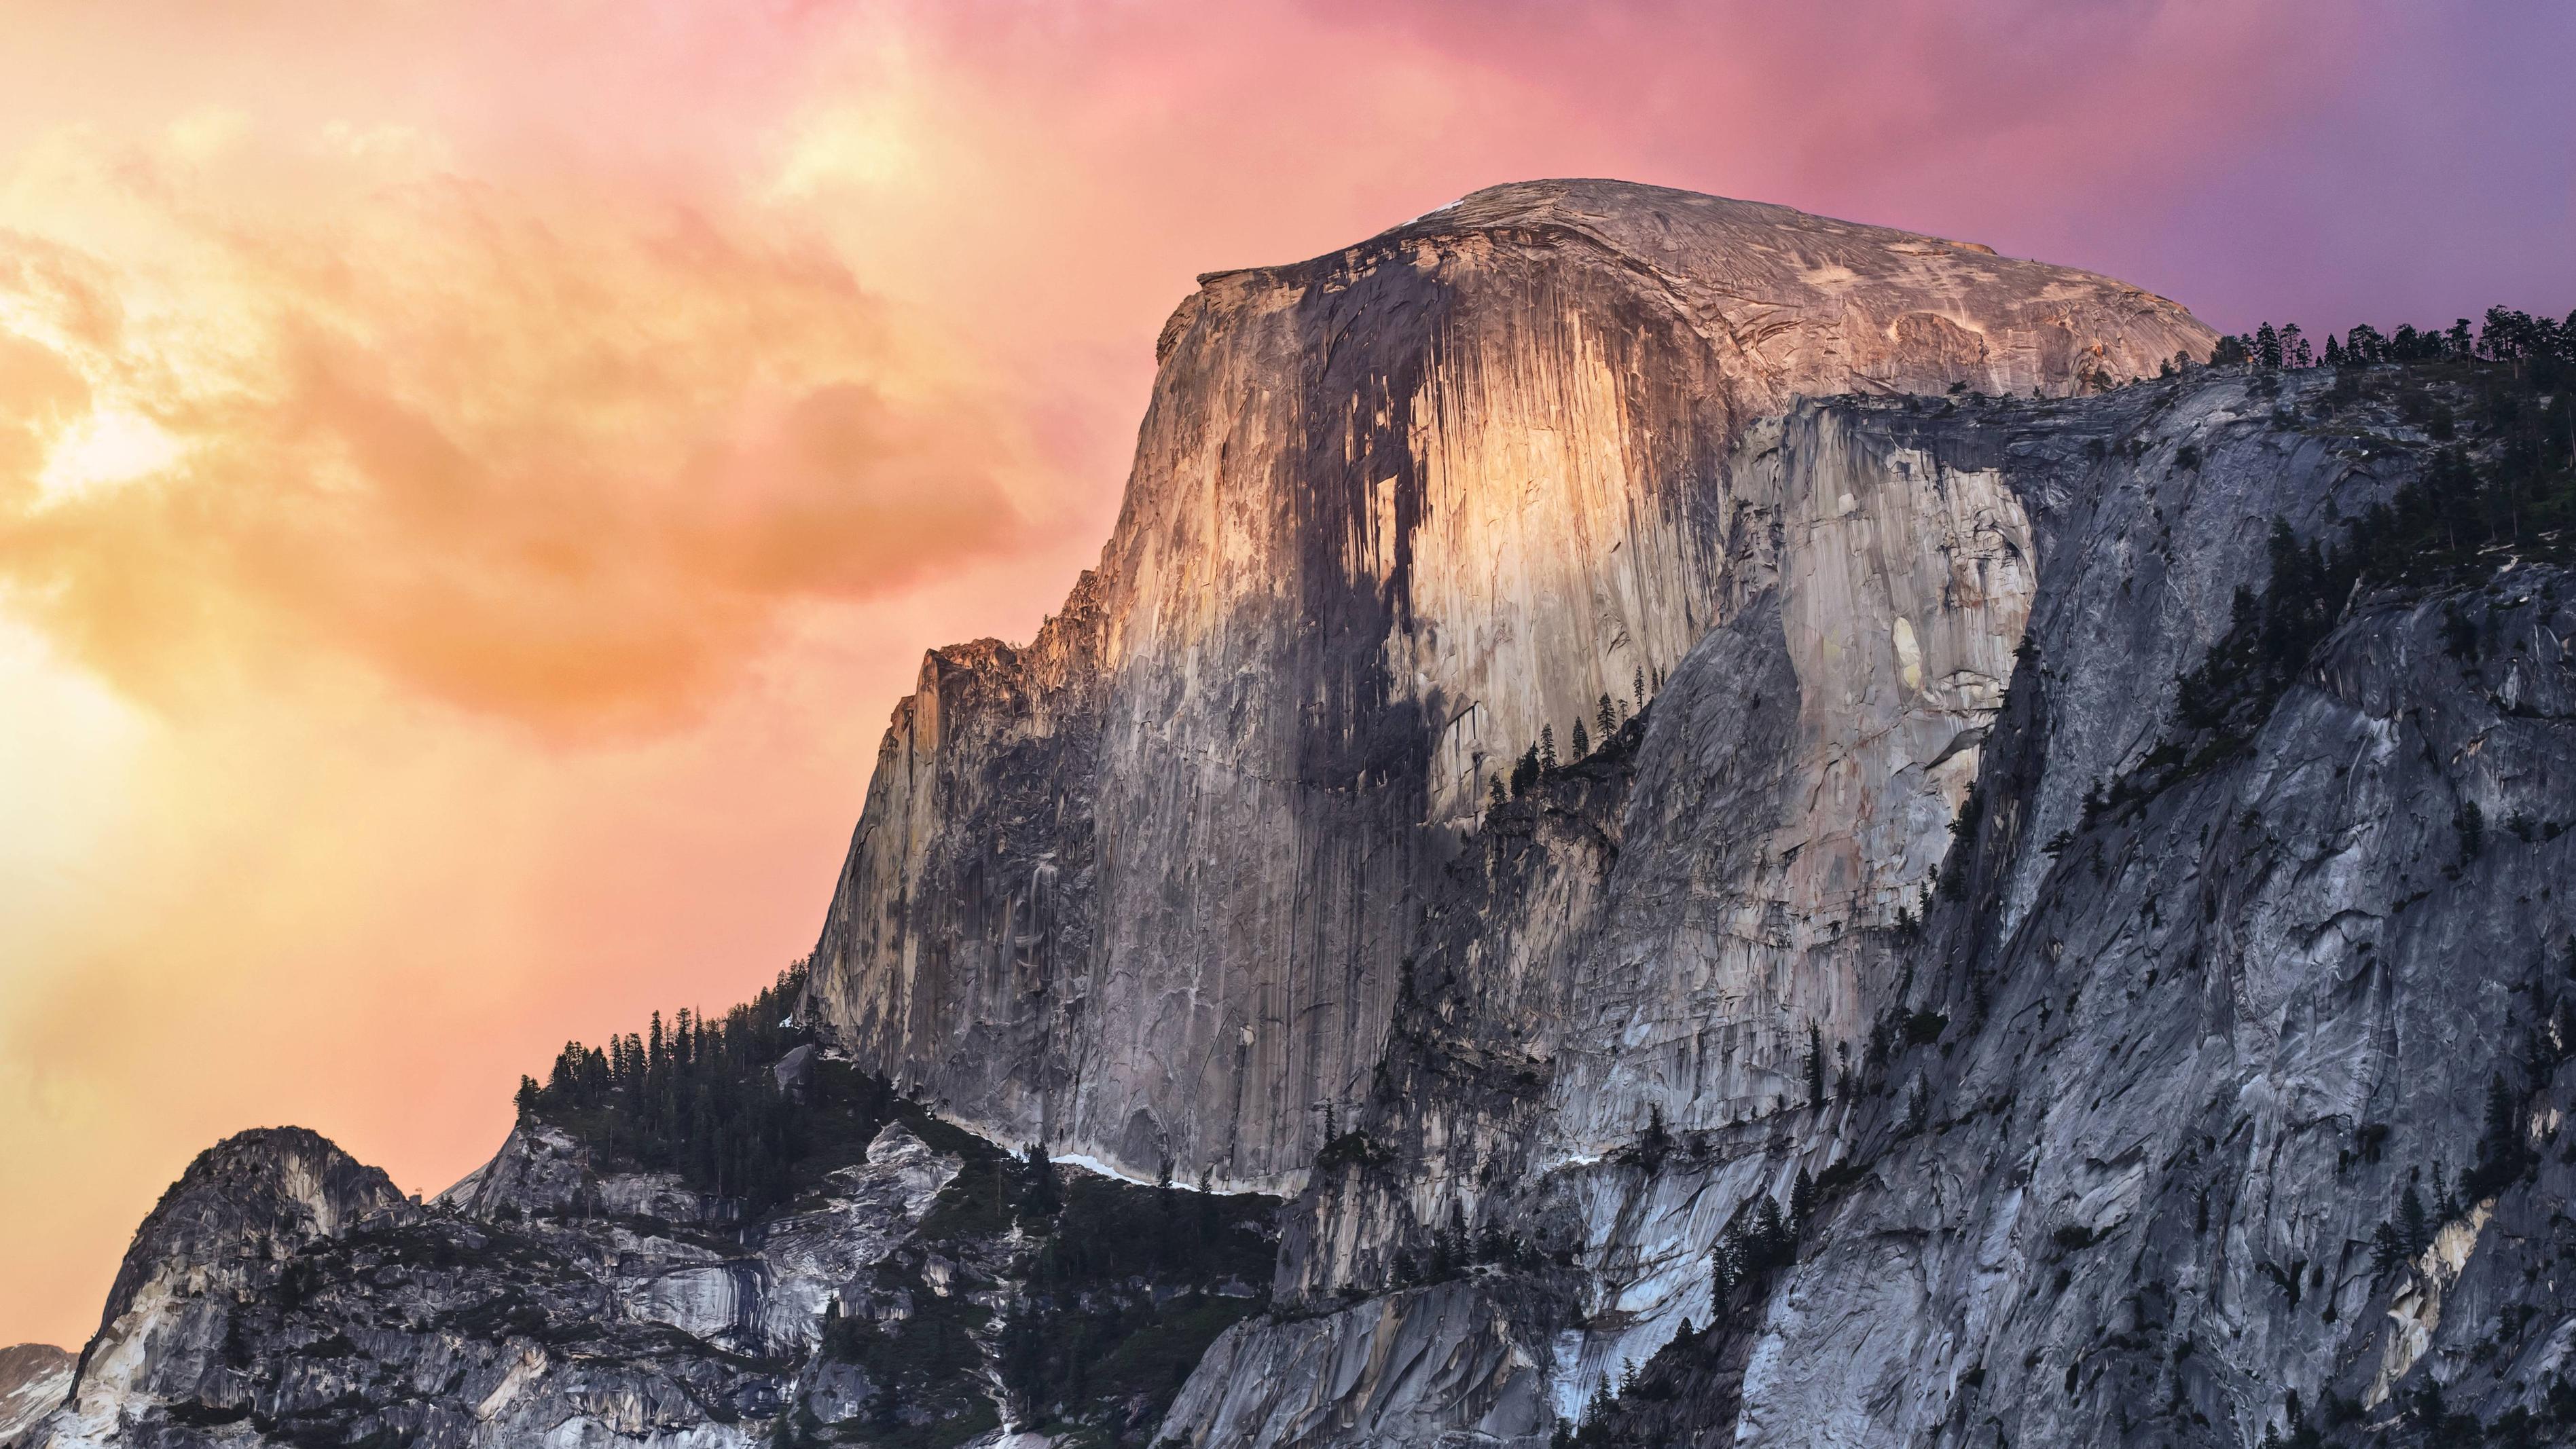 Apple Mac OS X 1010 Yosemite Wallpaper by cjchristianjoel on 3793x2134